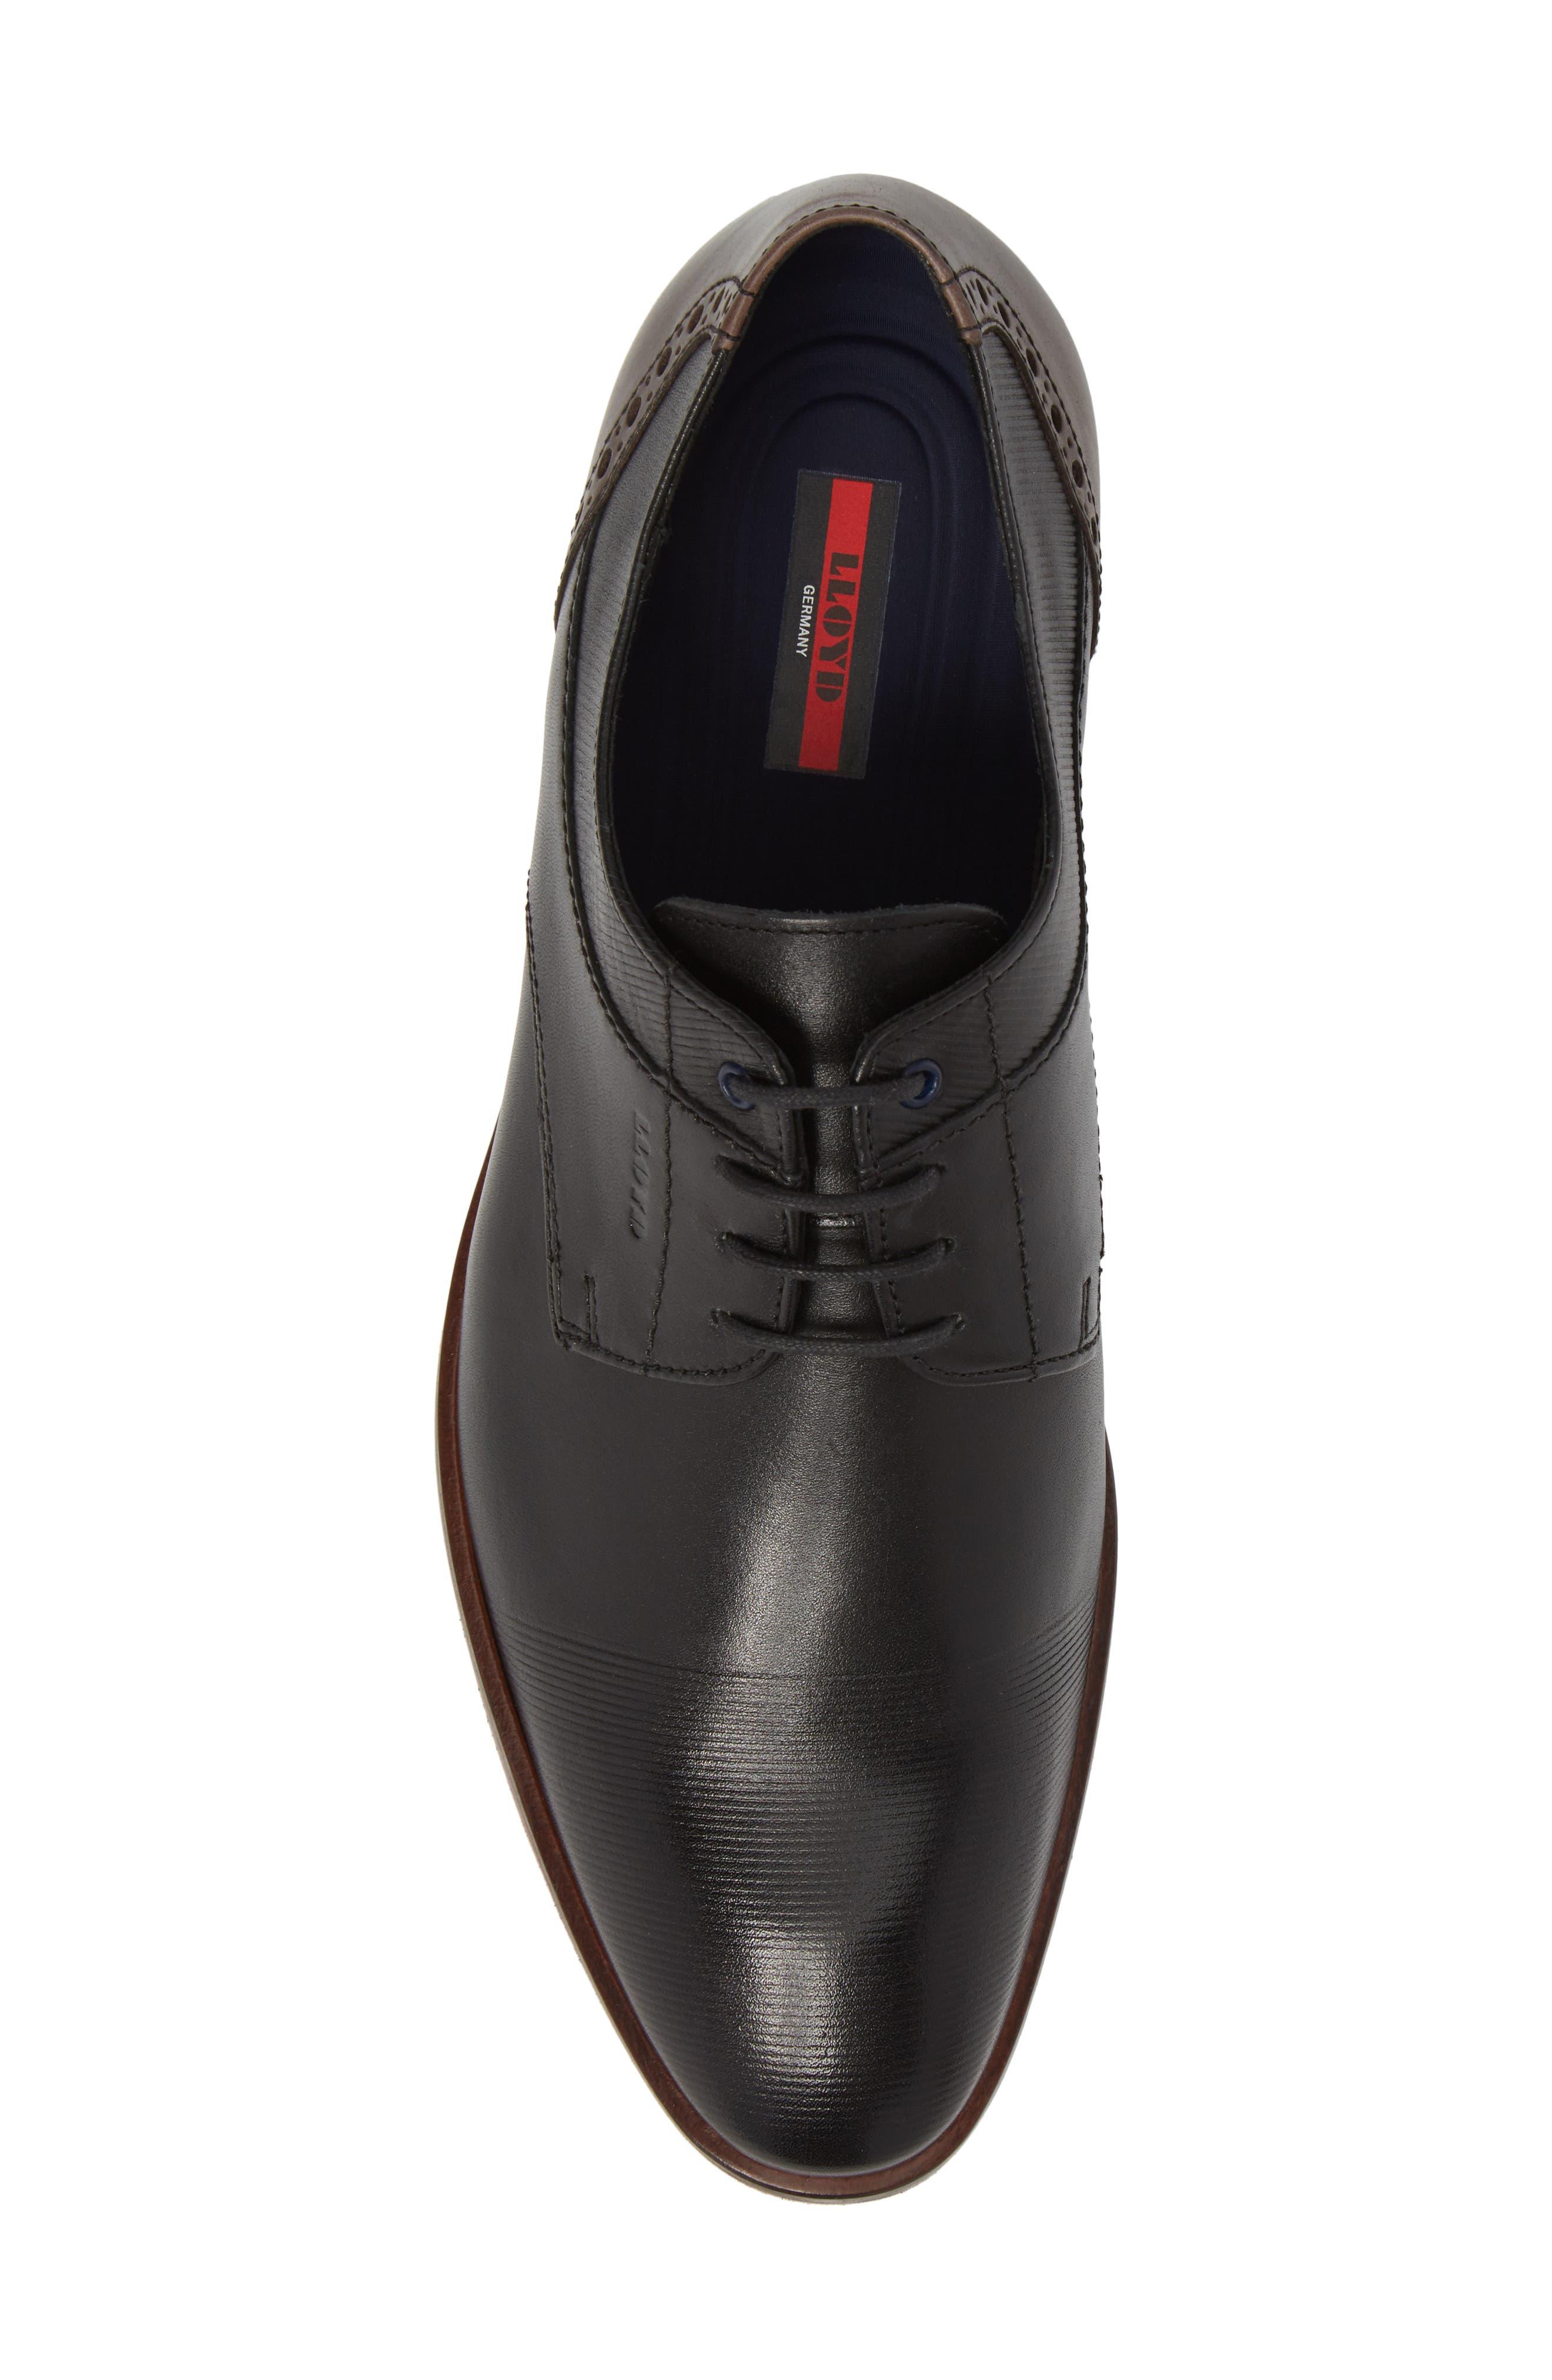 Henley Embossed Cap Toe Derby,                             Alternate thumbnail 5, color,                             Black/ Blue Leather